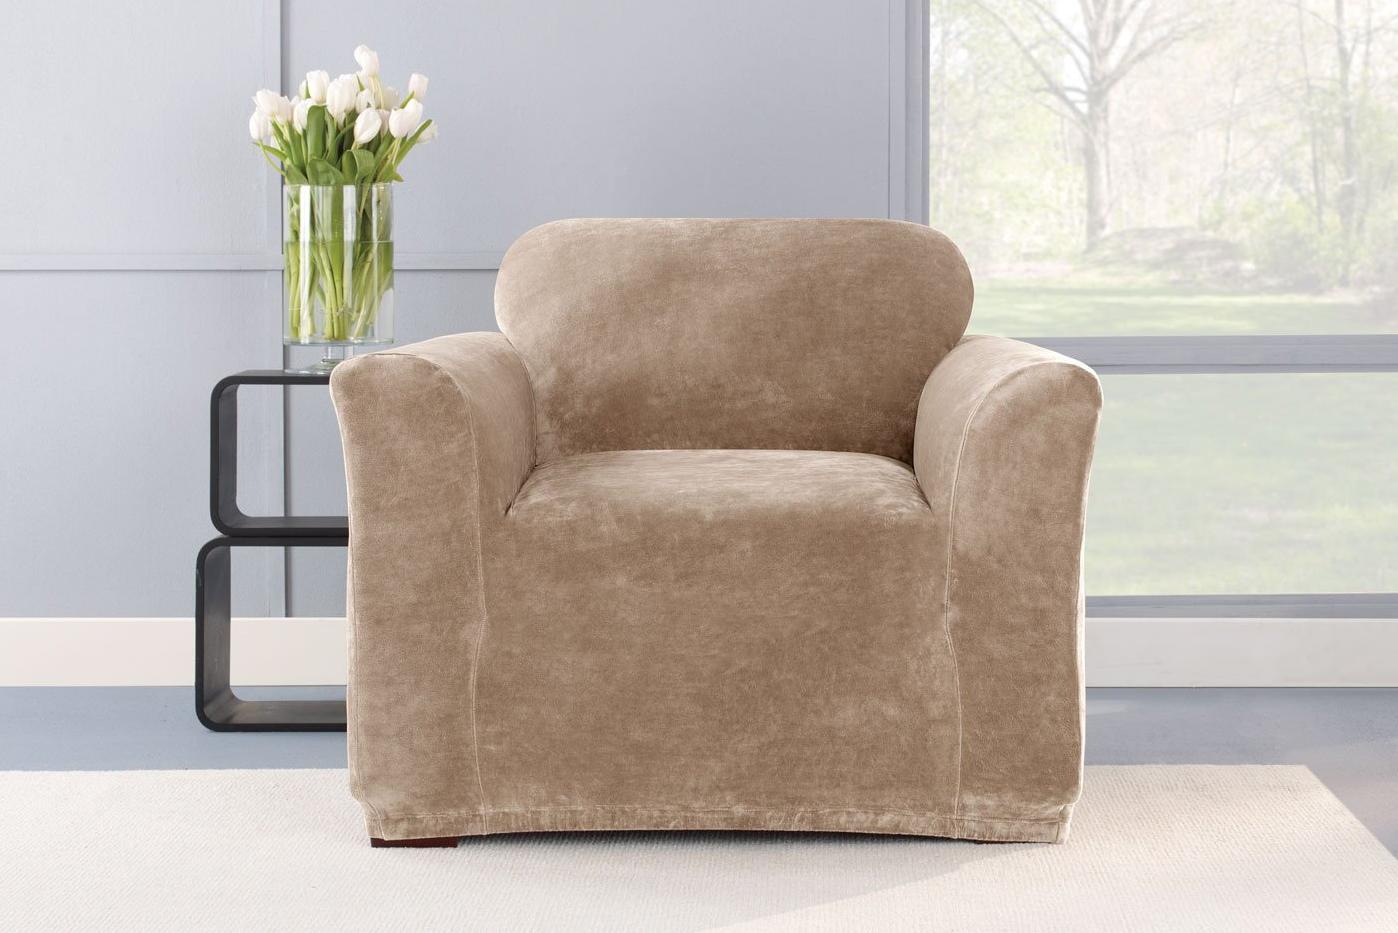 Чехол на кресло Медежда Бруклин